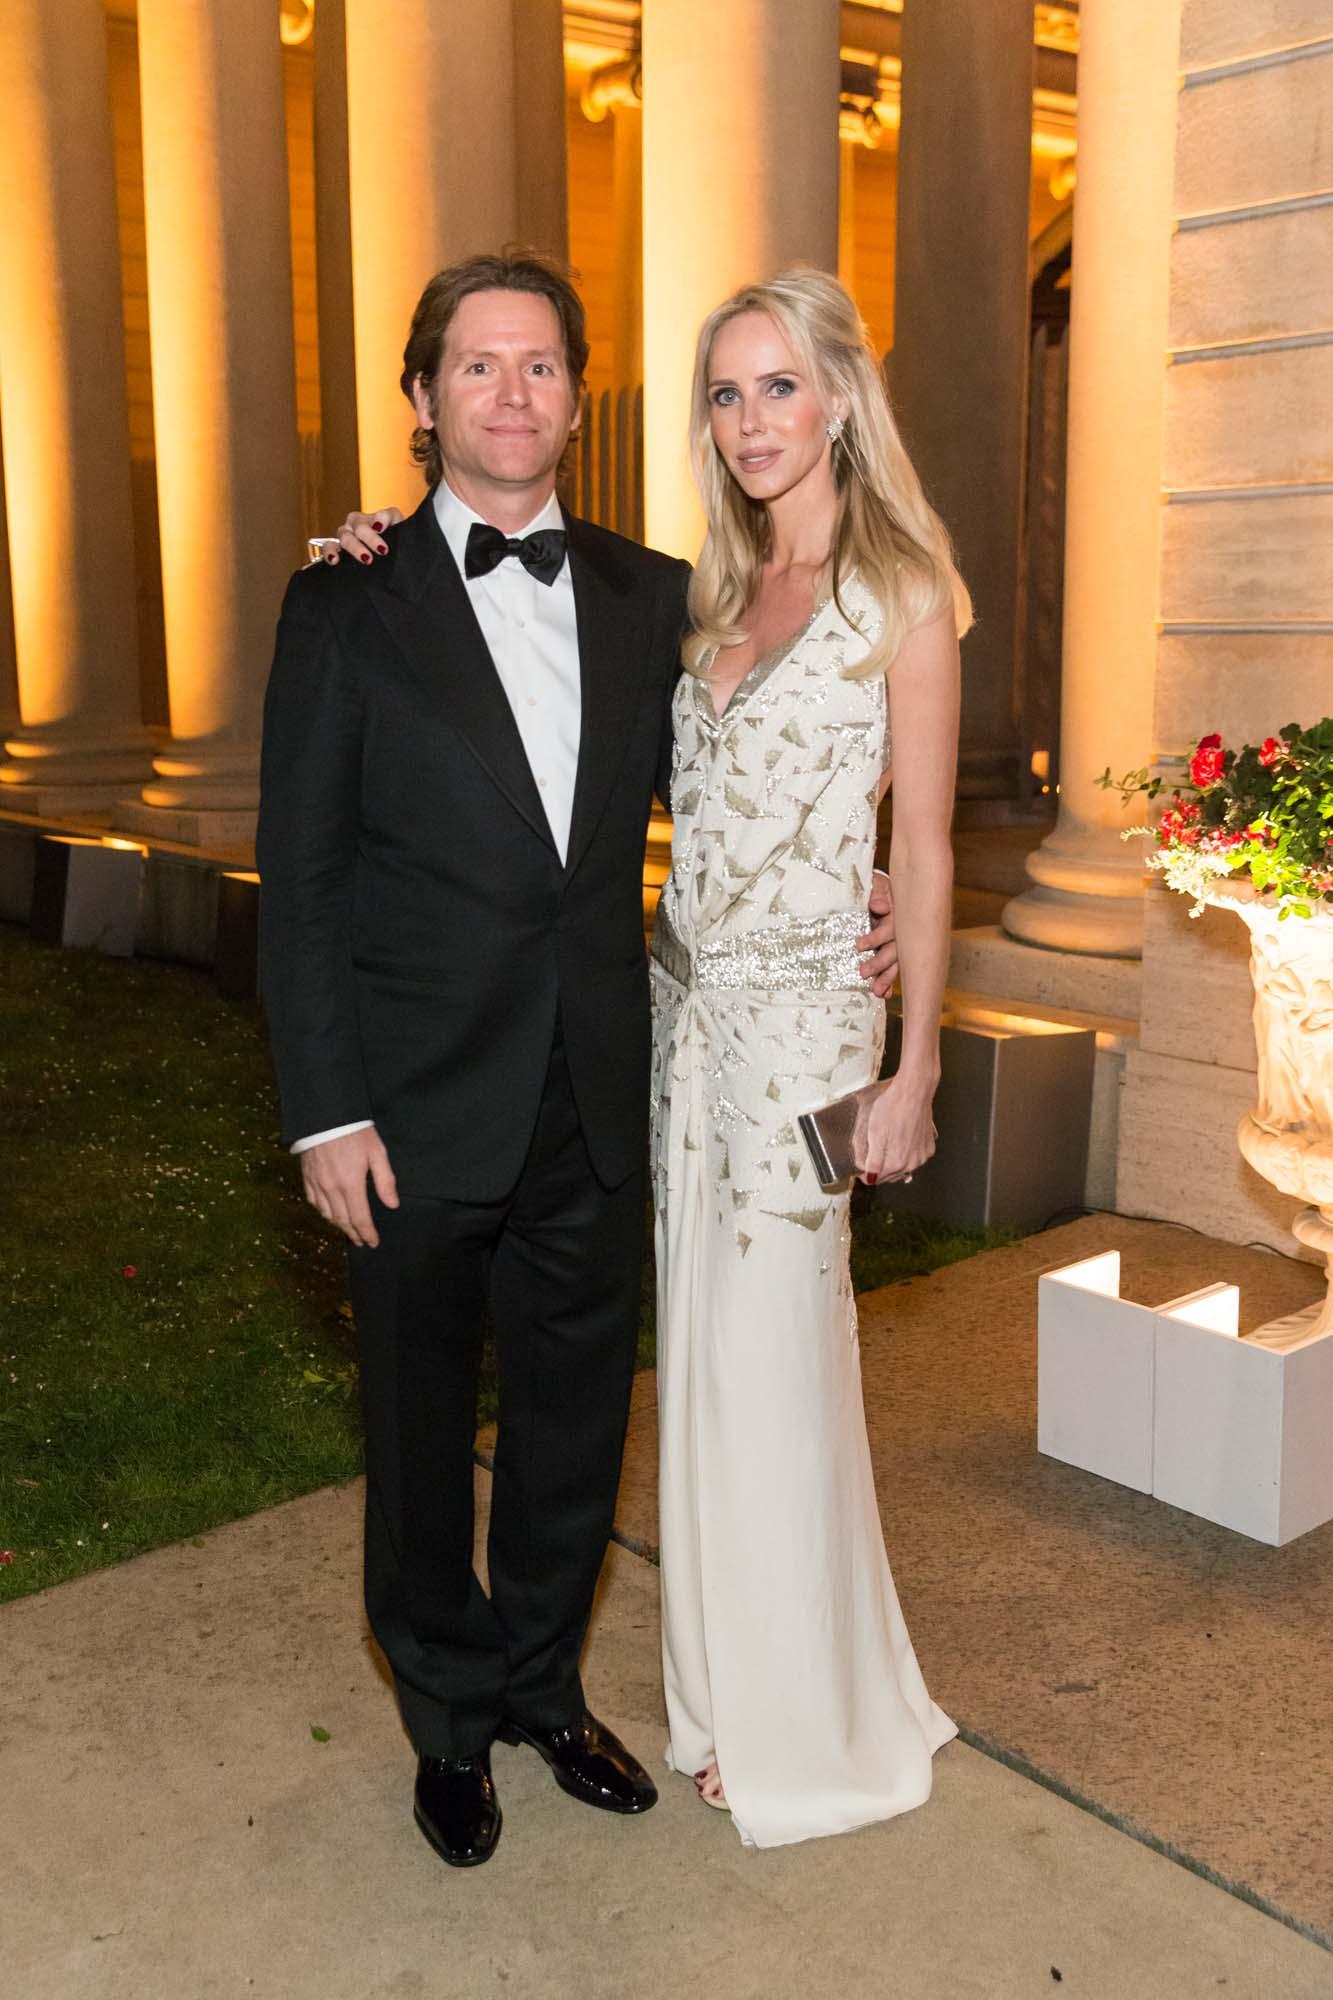 Trevor Traina, and Vanessa Getty at the Salvatore Ferragamo 2014 Mid-Winter gala to benefit the Fine Arts Museums, San Francisco